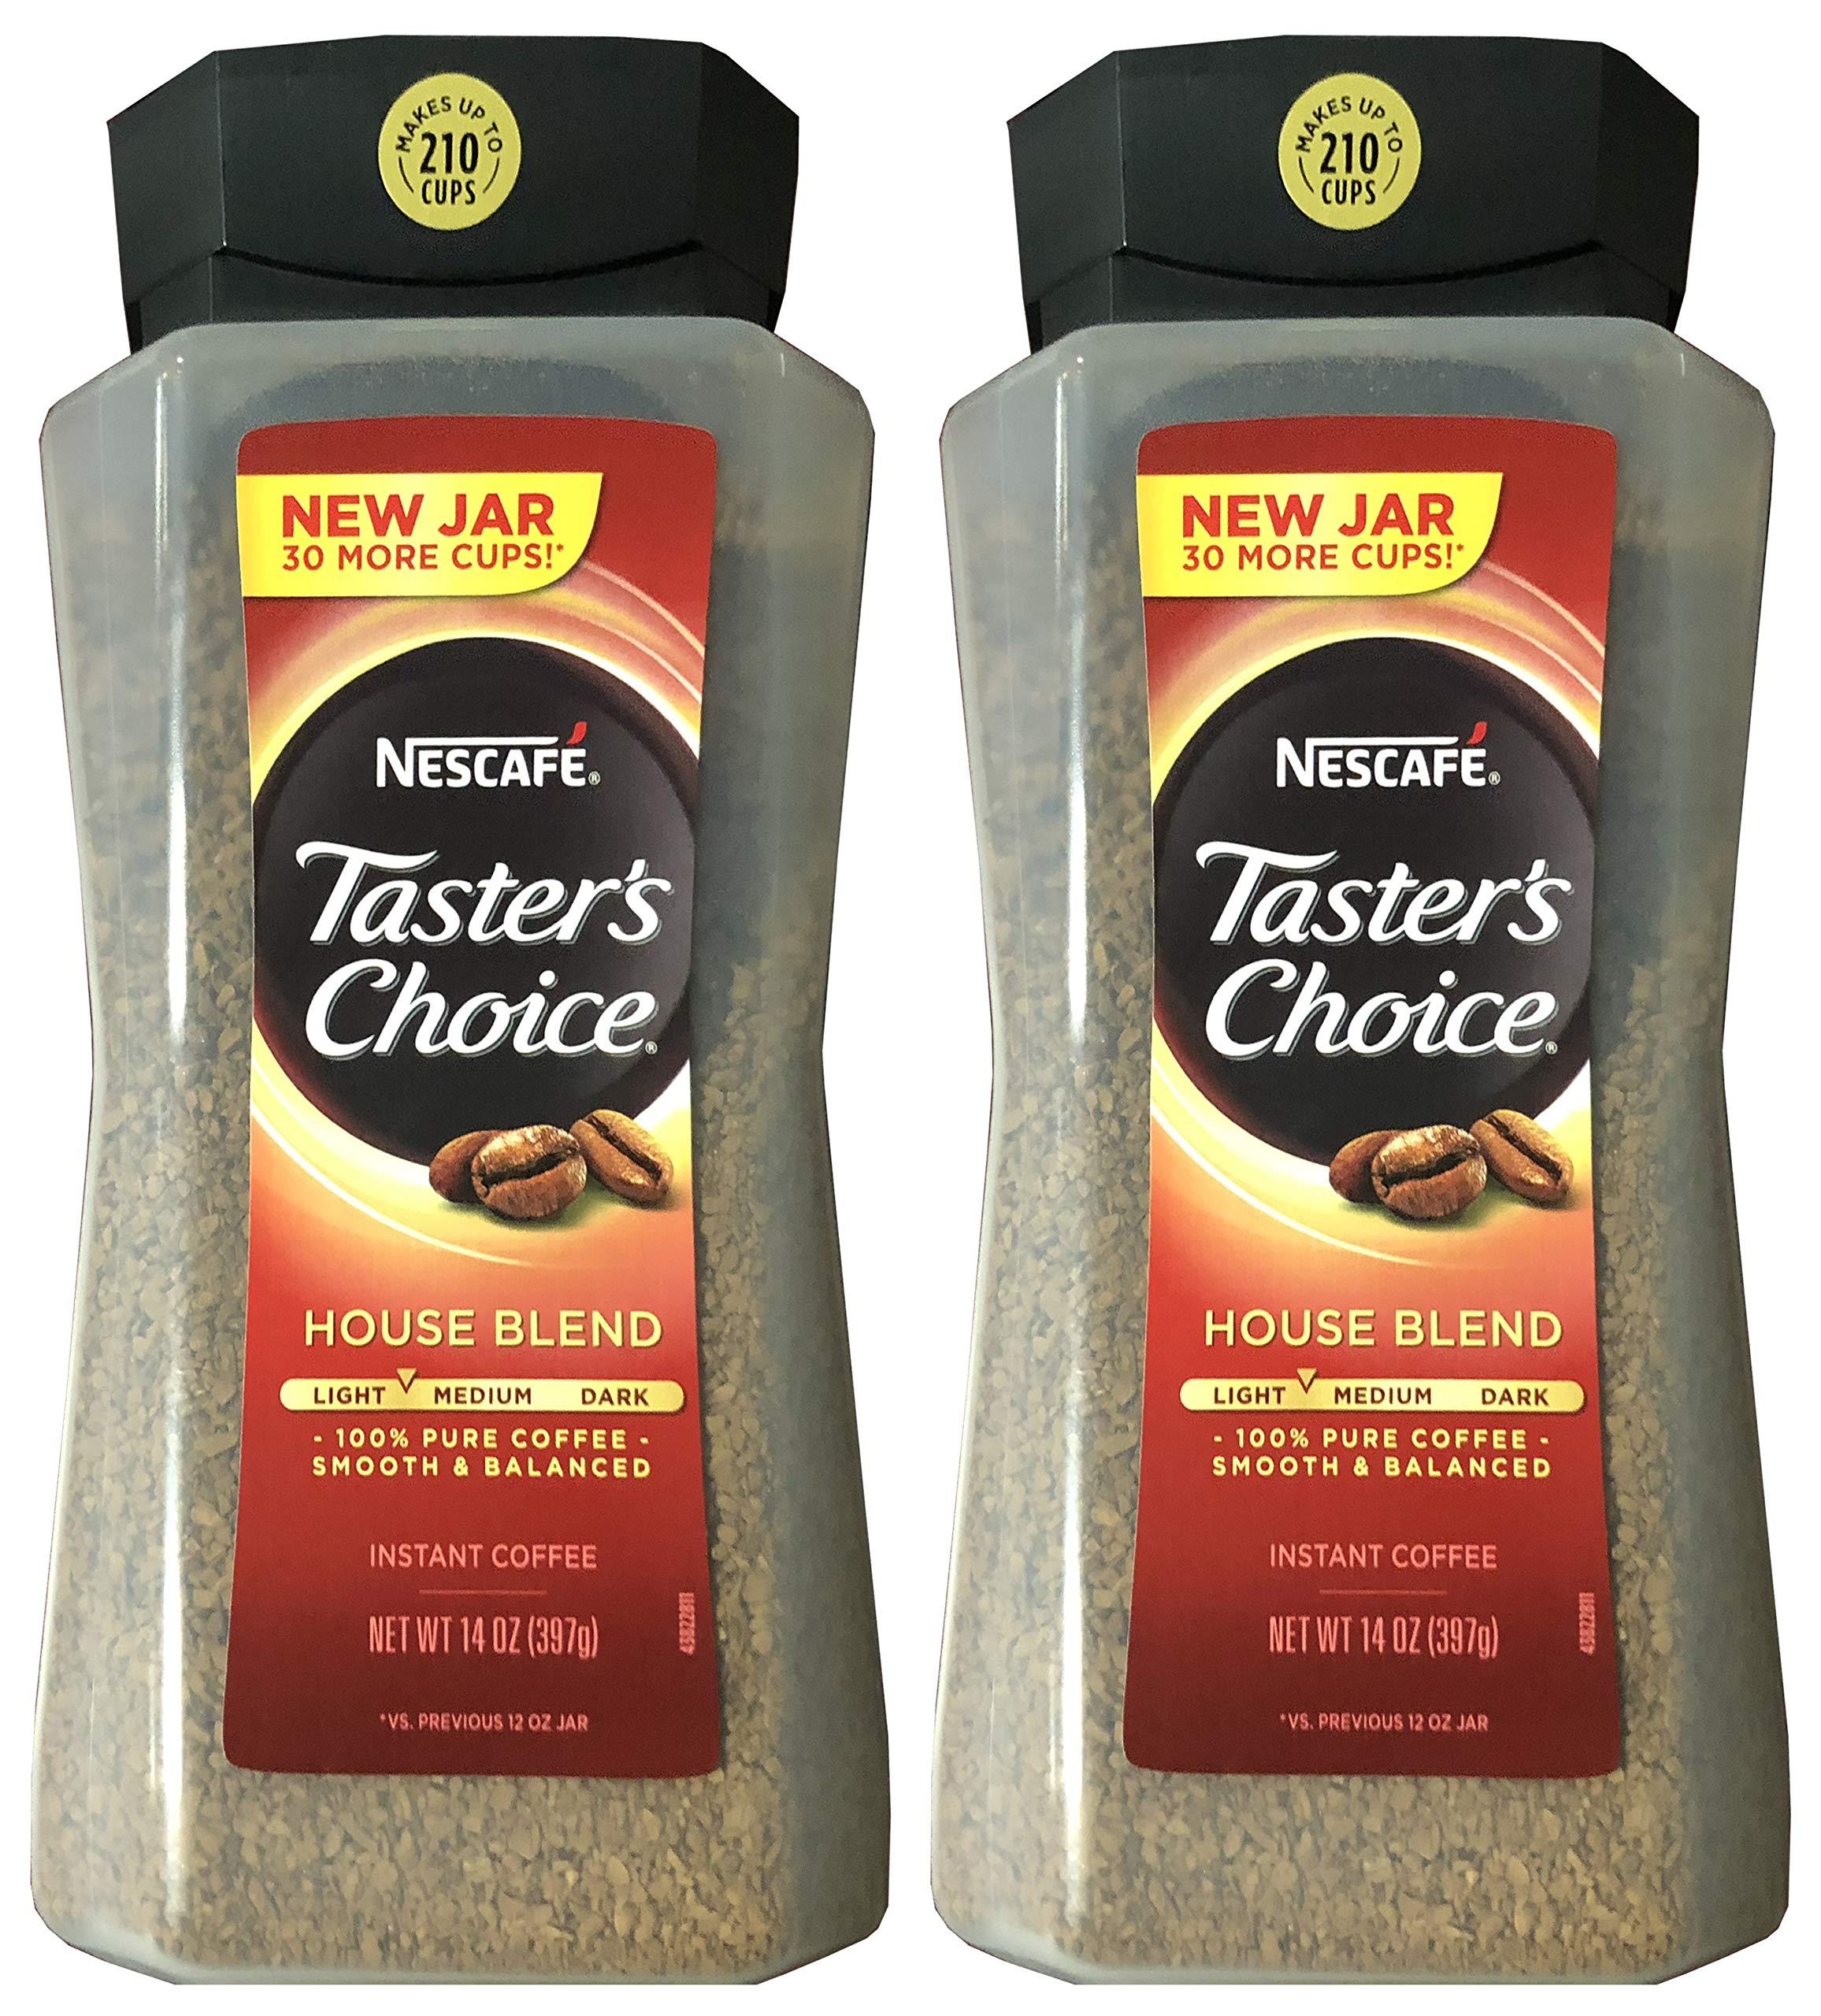 Taster's Choice Original Gourmet Instant Coffee 14 Oz, Pack of 2